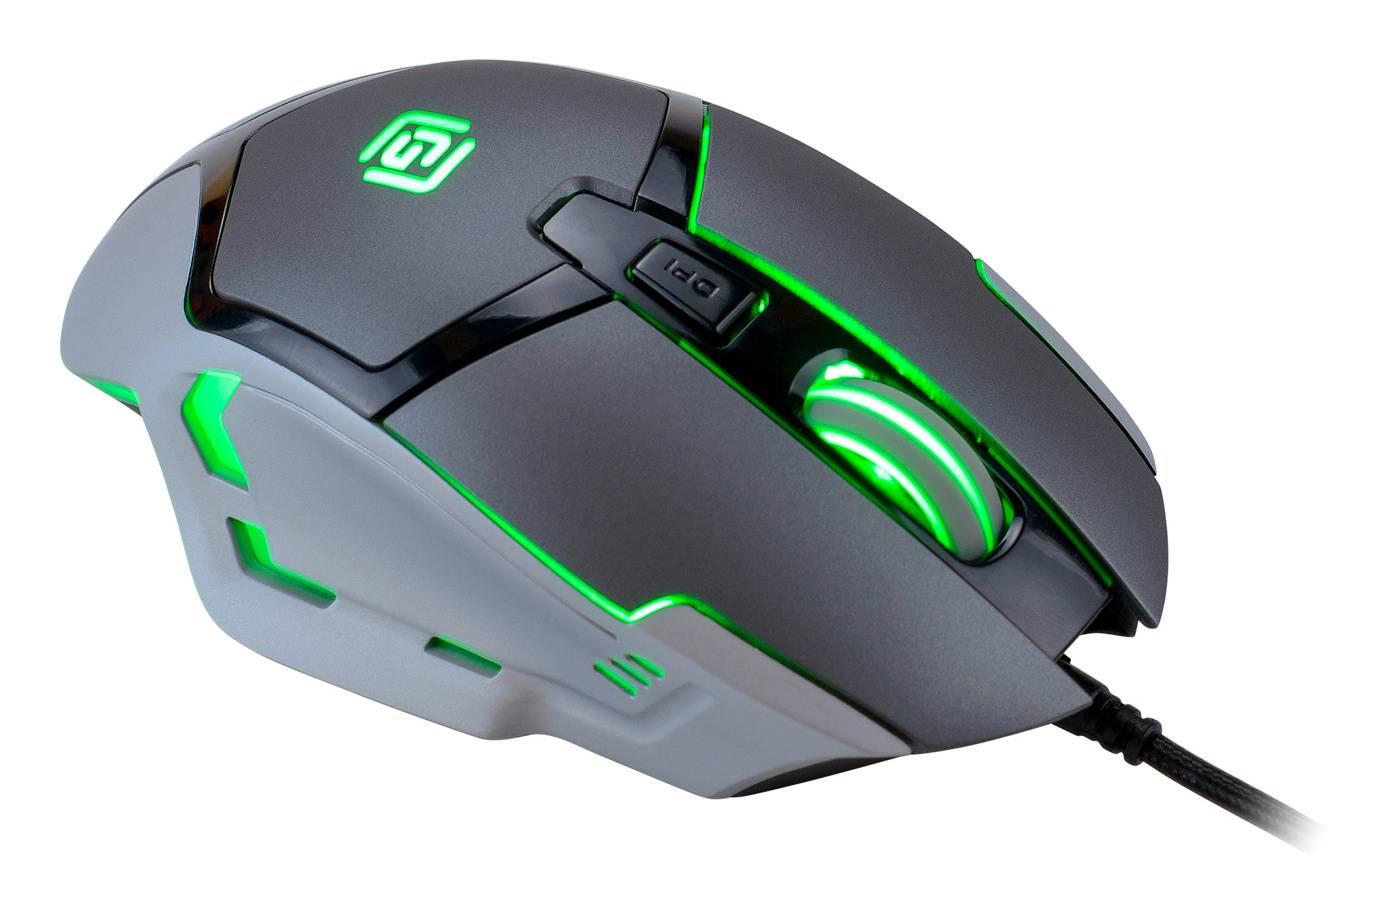 Мышь Oklick 915G HELLWISH V2 черный/серебристый - фото 15